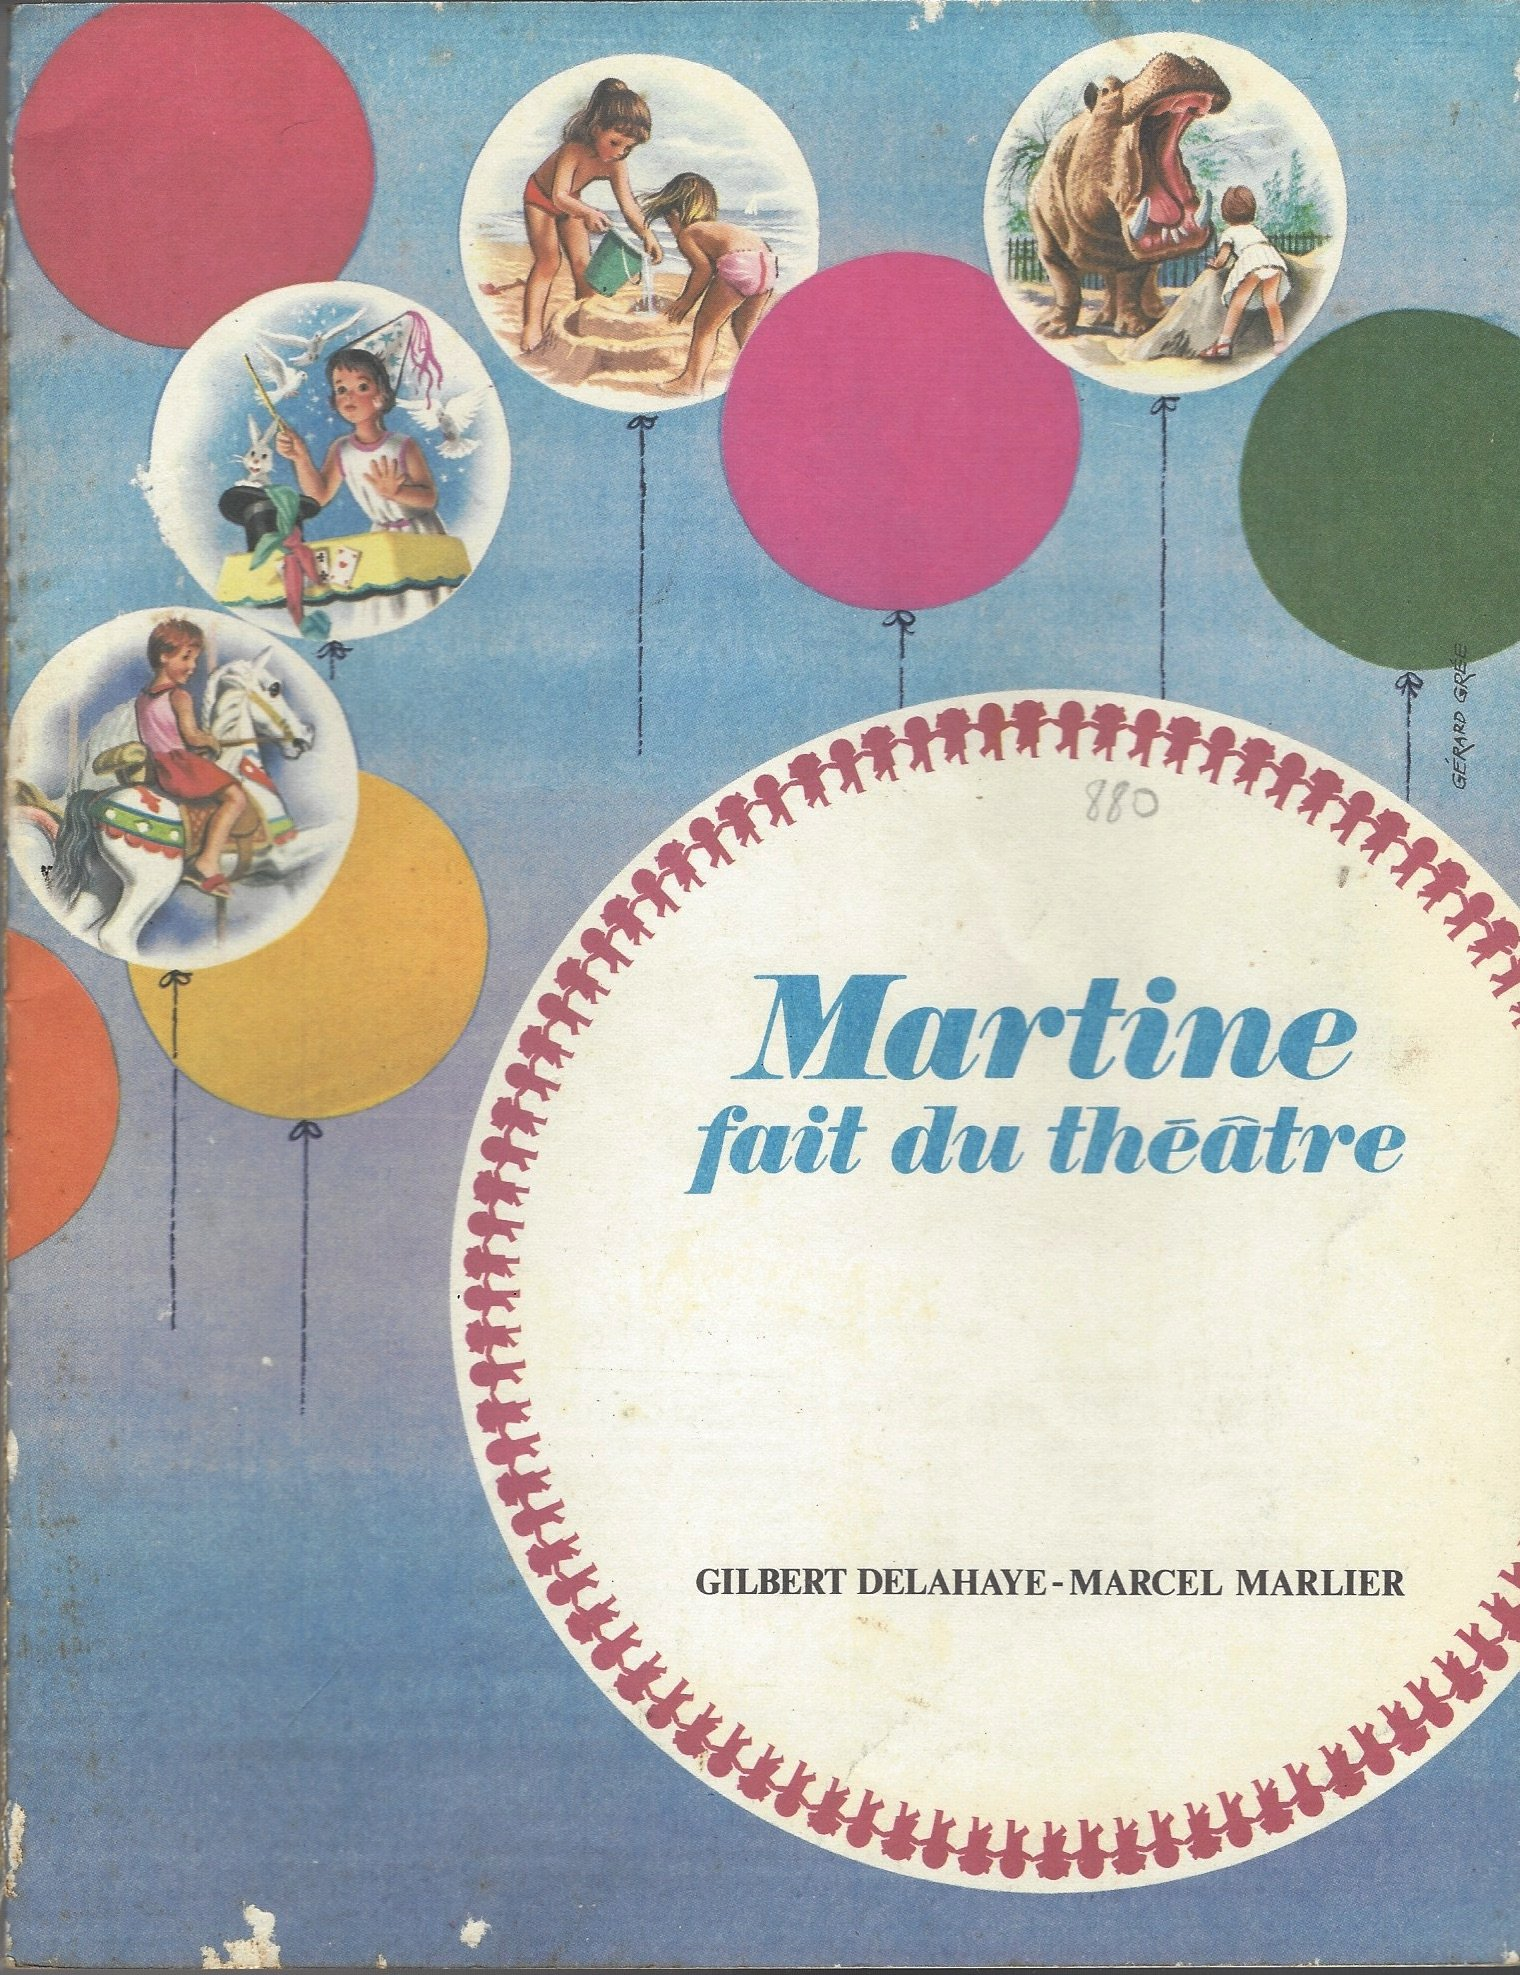 Martine Fait Du Theatre Gilbert Delahaye Marcel Marlier